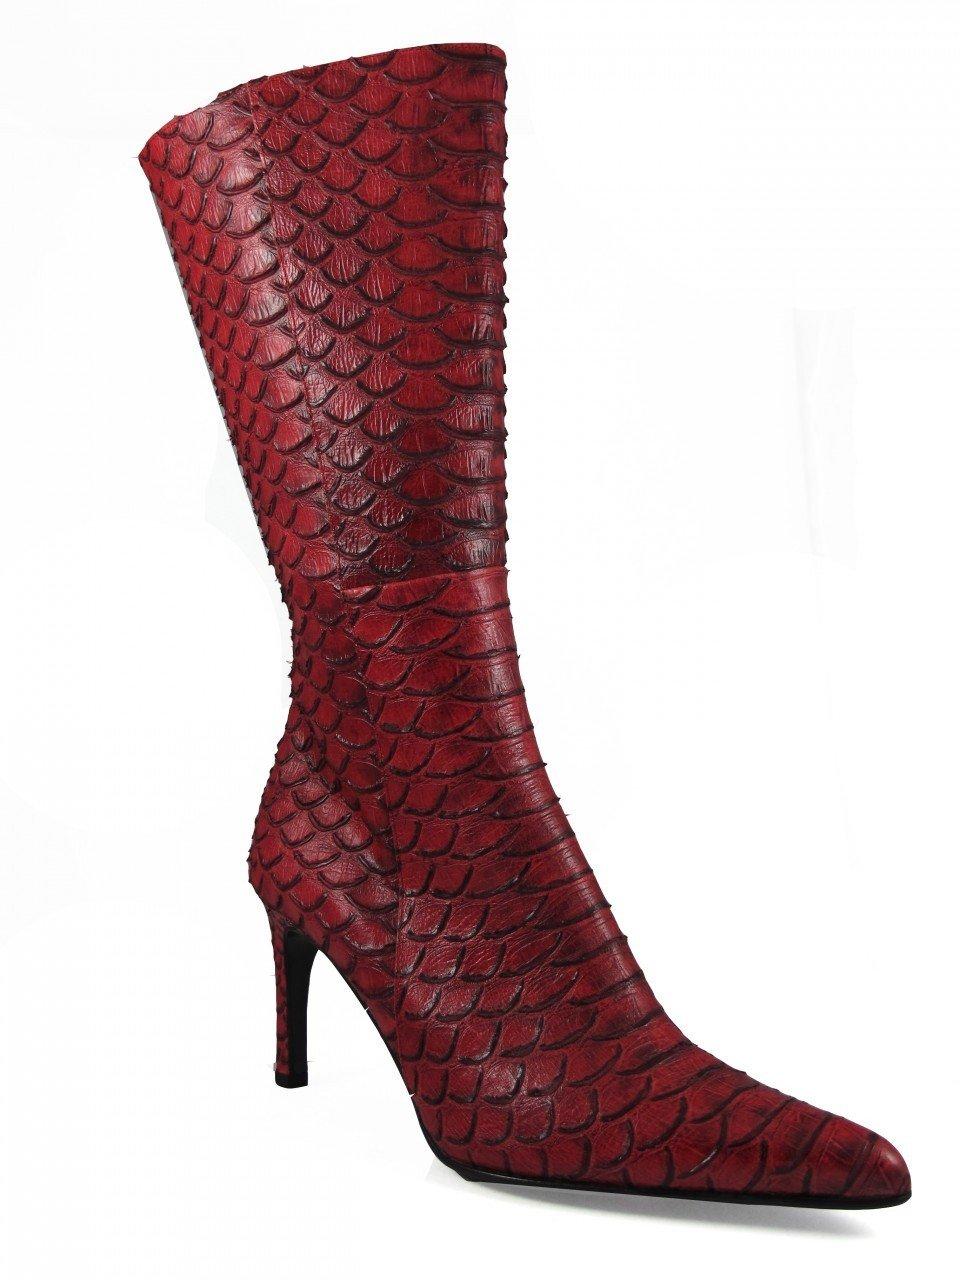 DA'VINCI 4051 Women's Italian Leather Python Print Dress/Casual Low Heel Pointy Toe Boot,Red Size 37